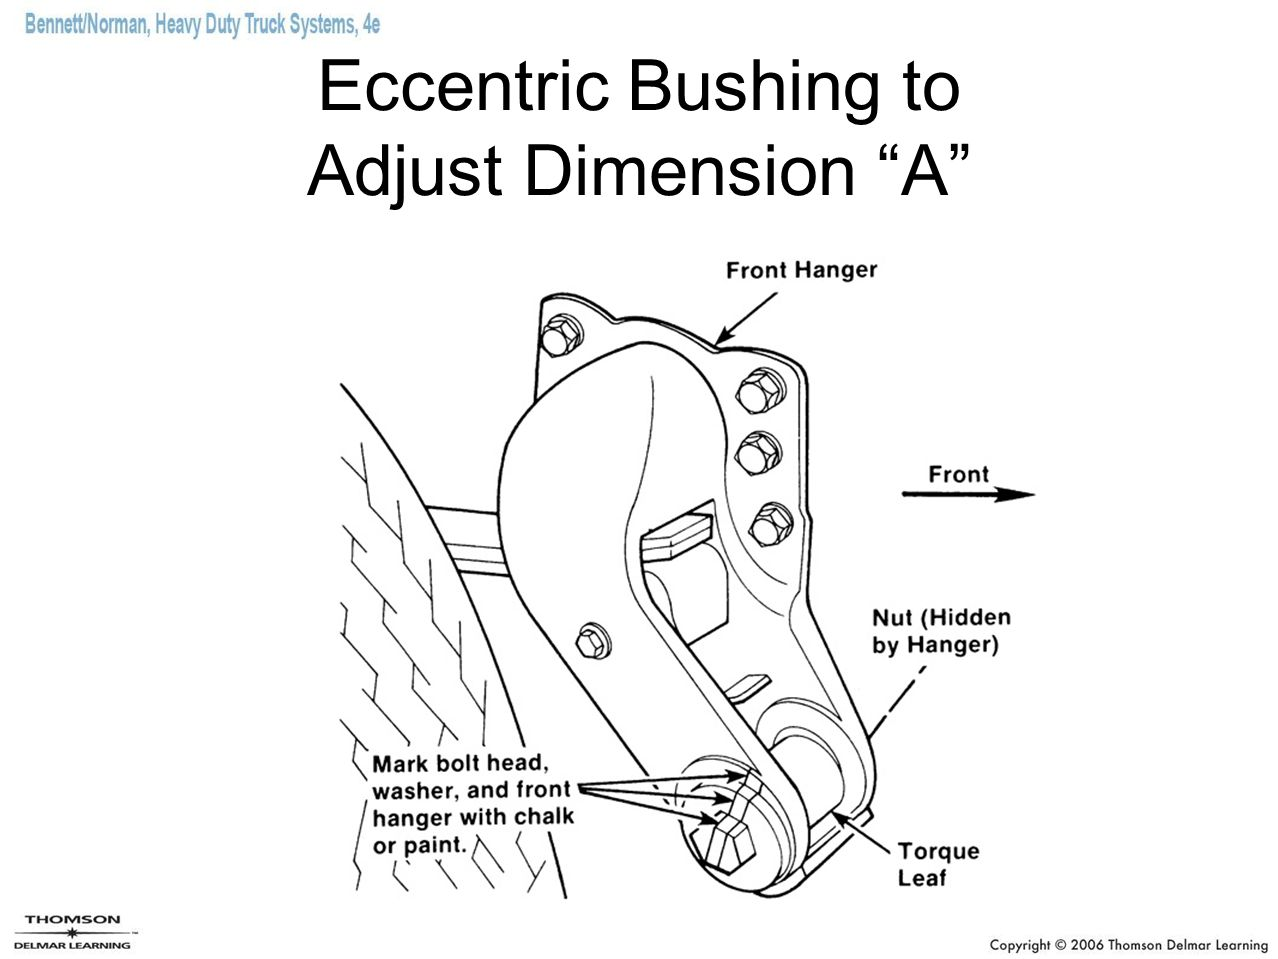 Eccentric Bushing to Adjust Dimension A